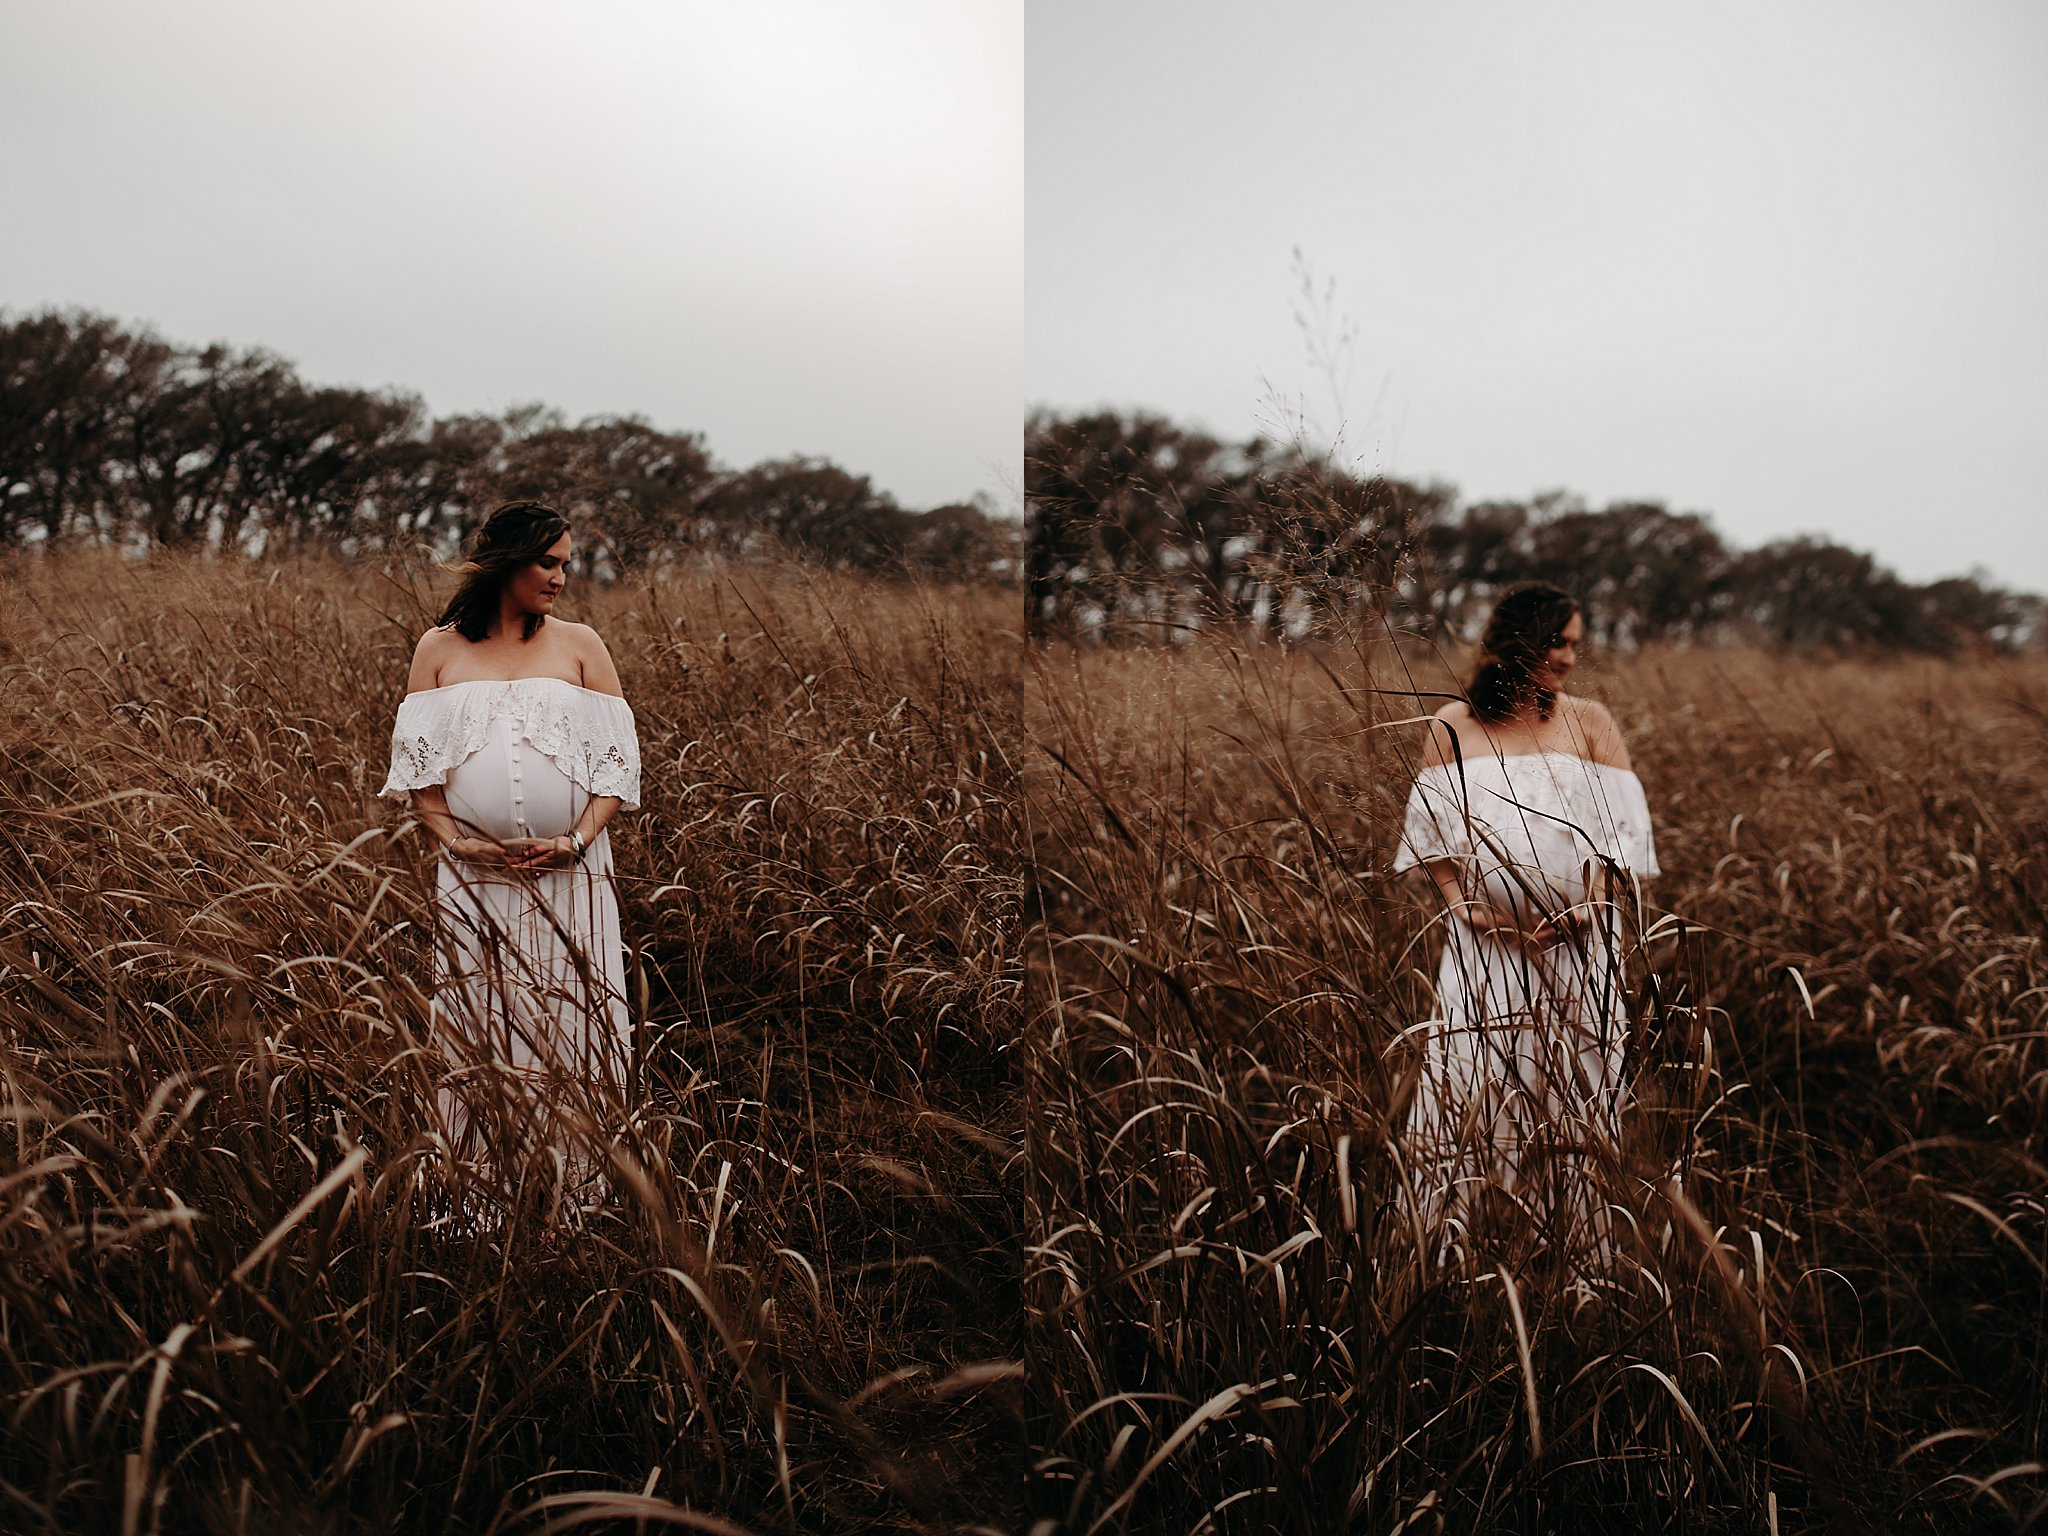 Katie-San-Antonio-Maternity-Photographer-52_WEB.jpg